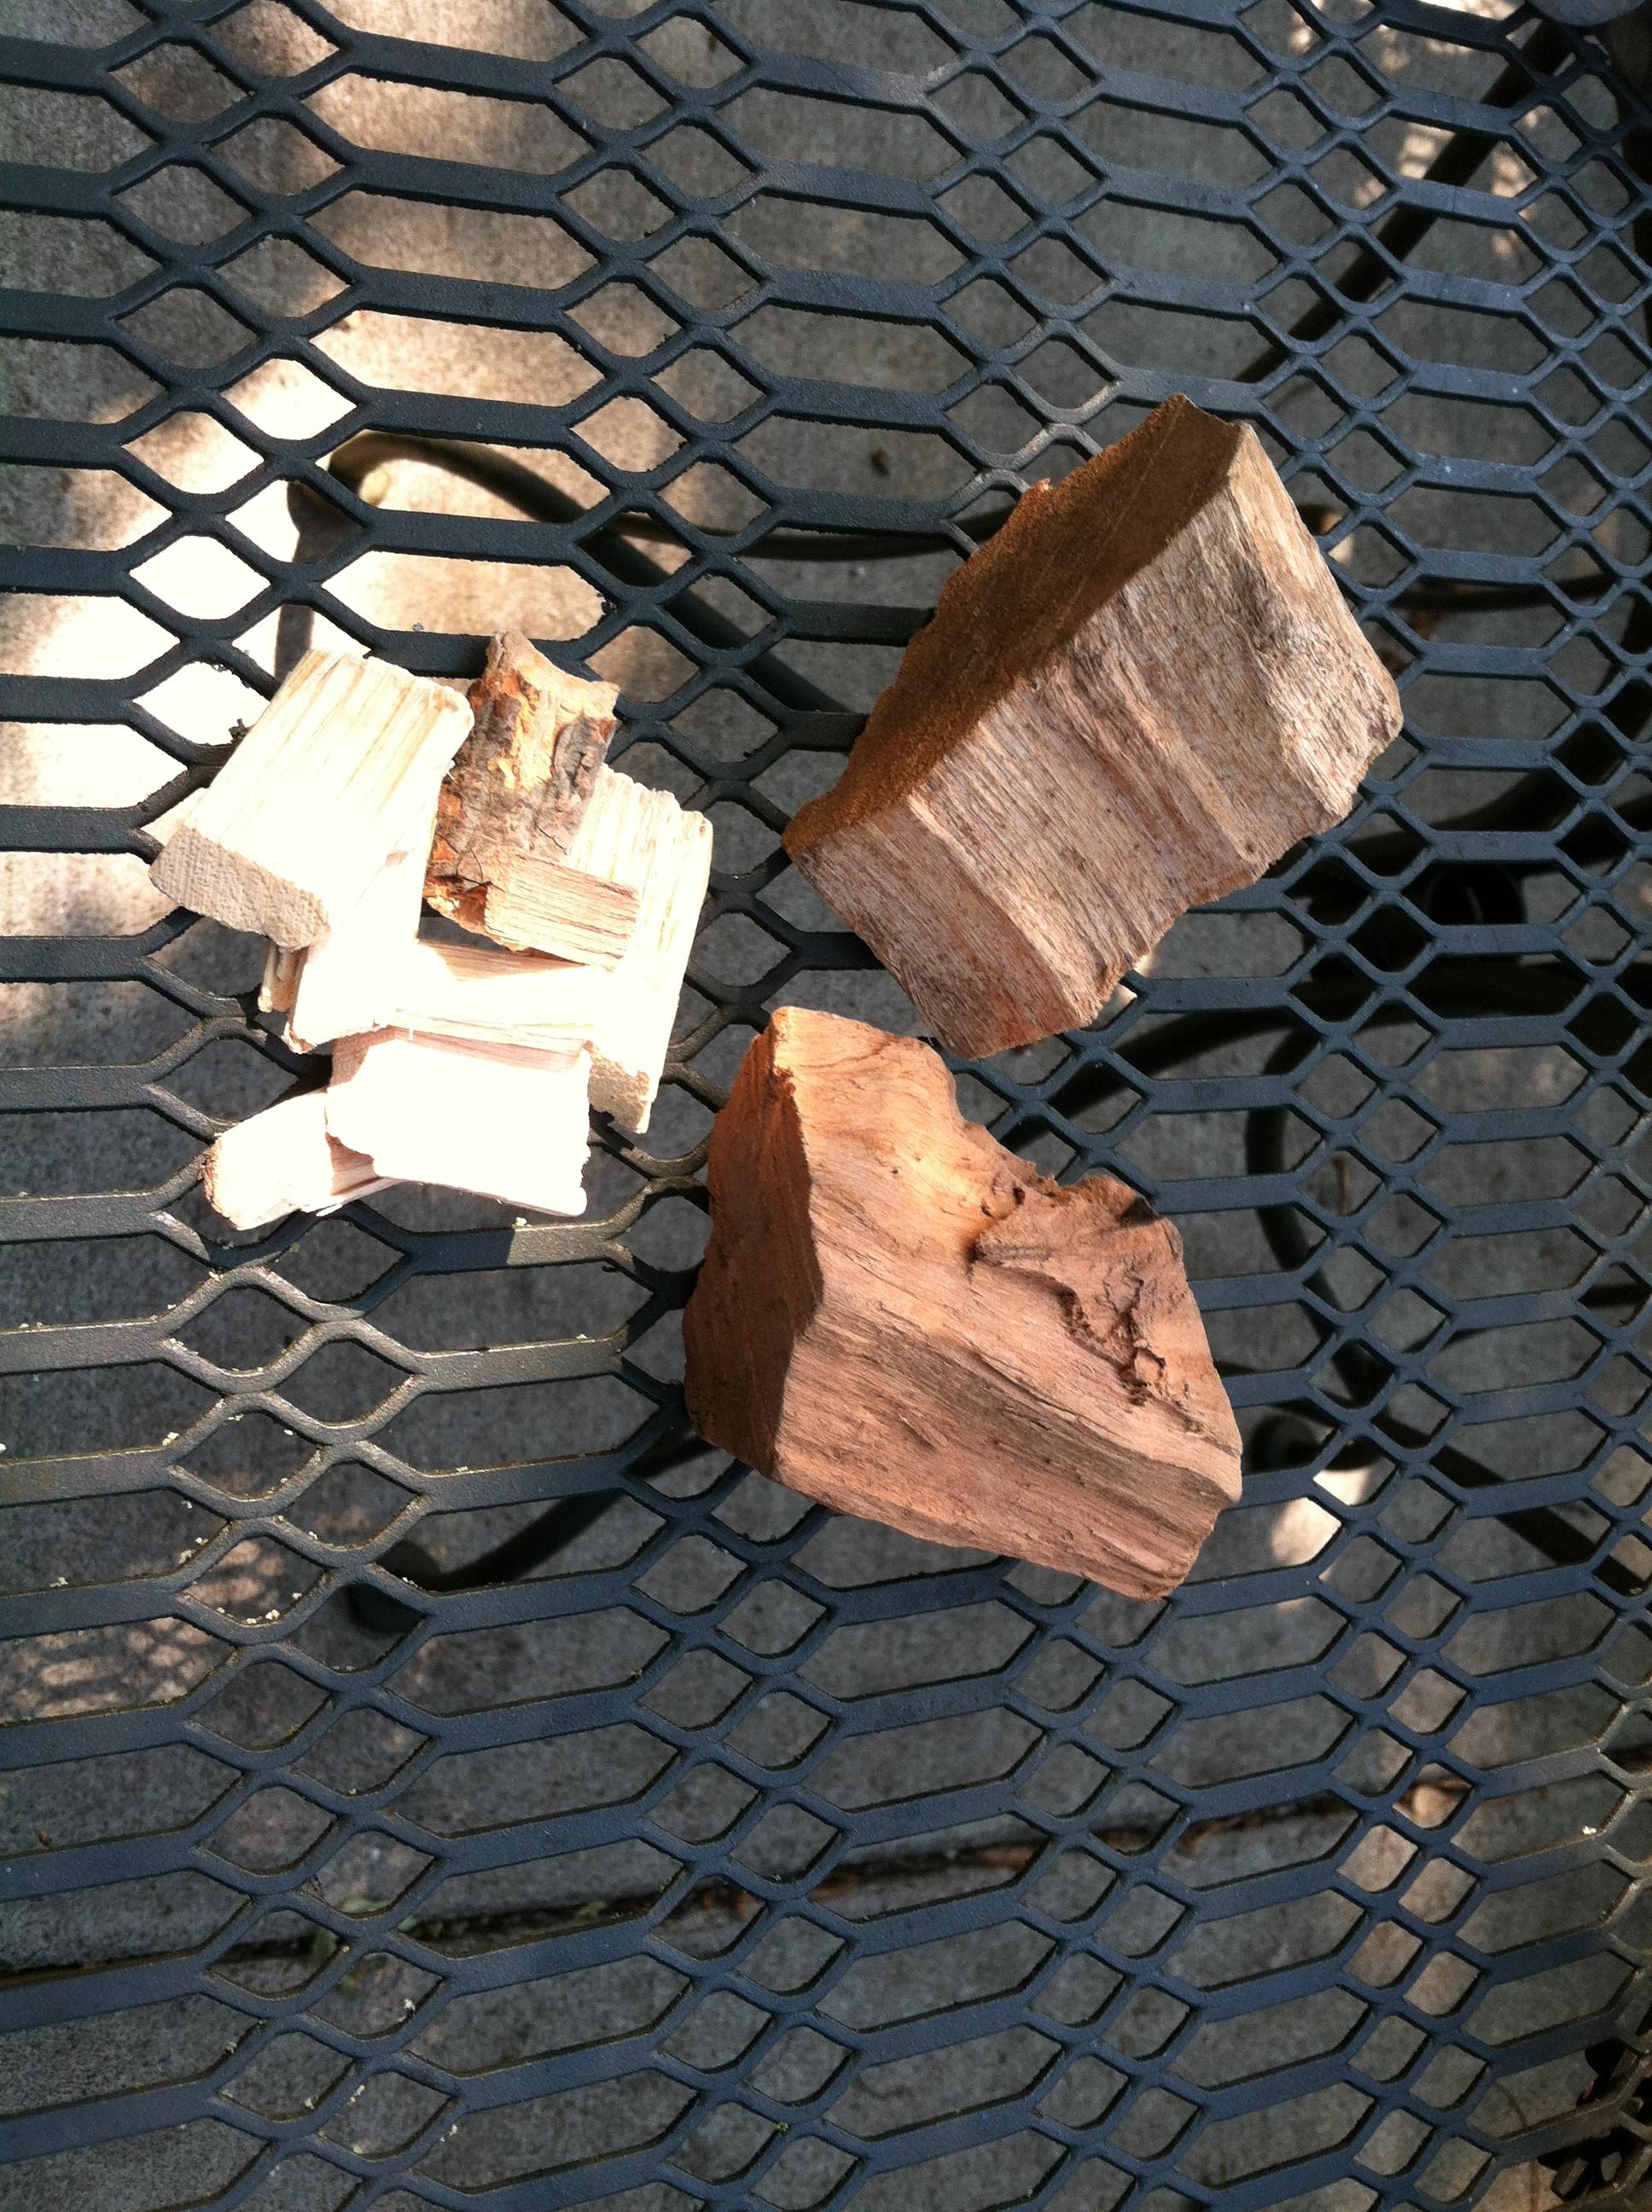 Best Wood Chips Smoking Brisket : Smokenator texas brisket recipe foodiepdx